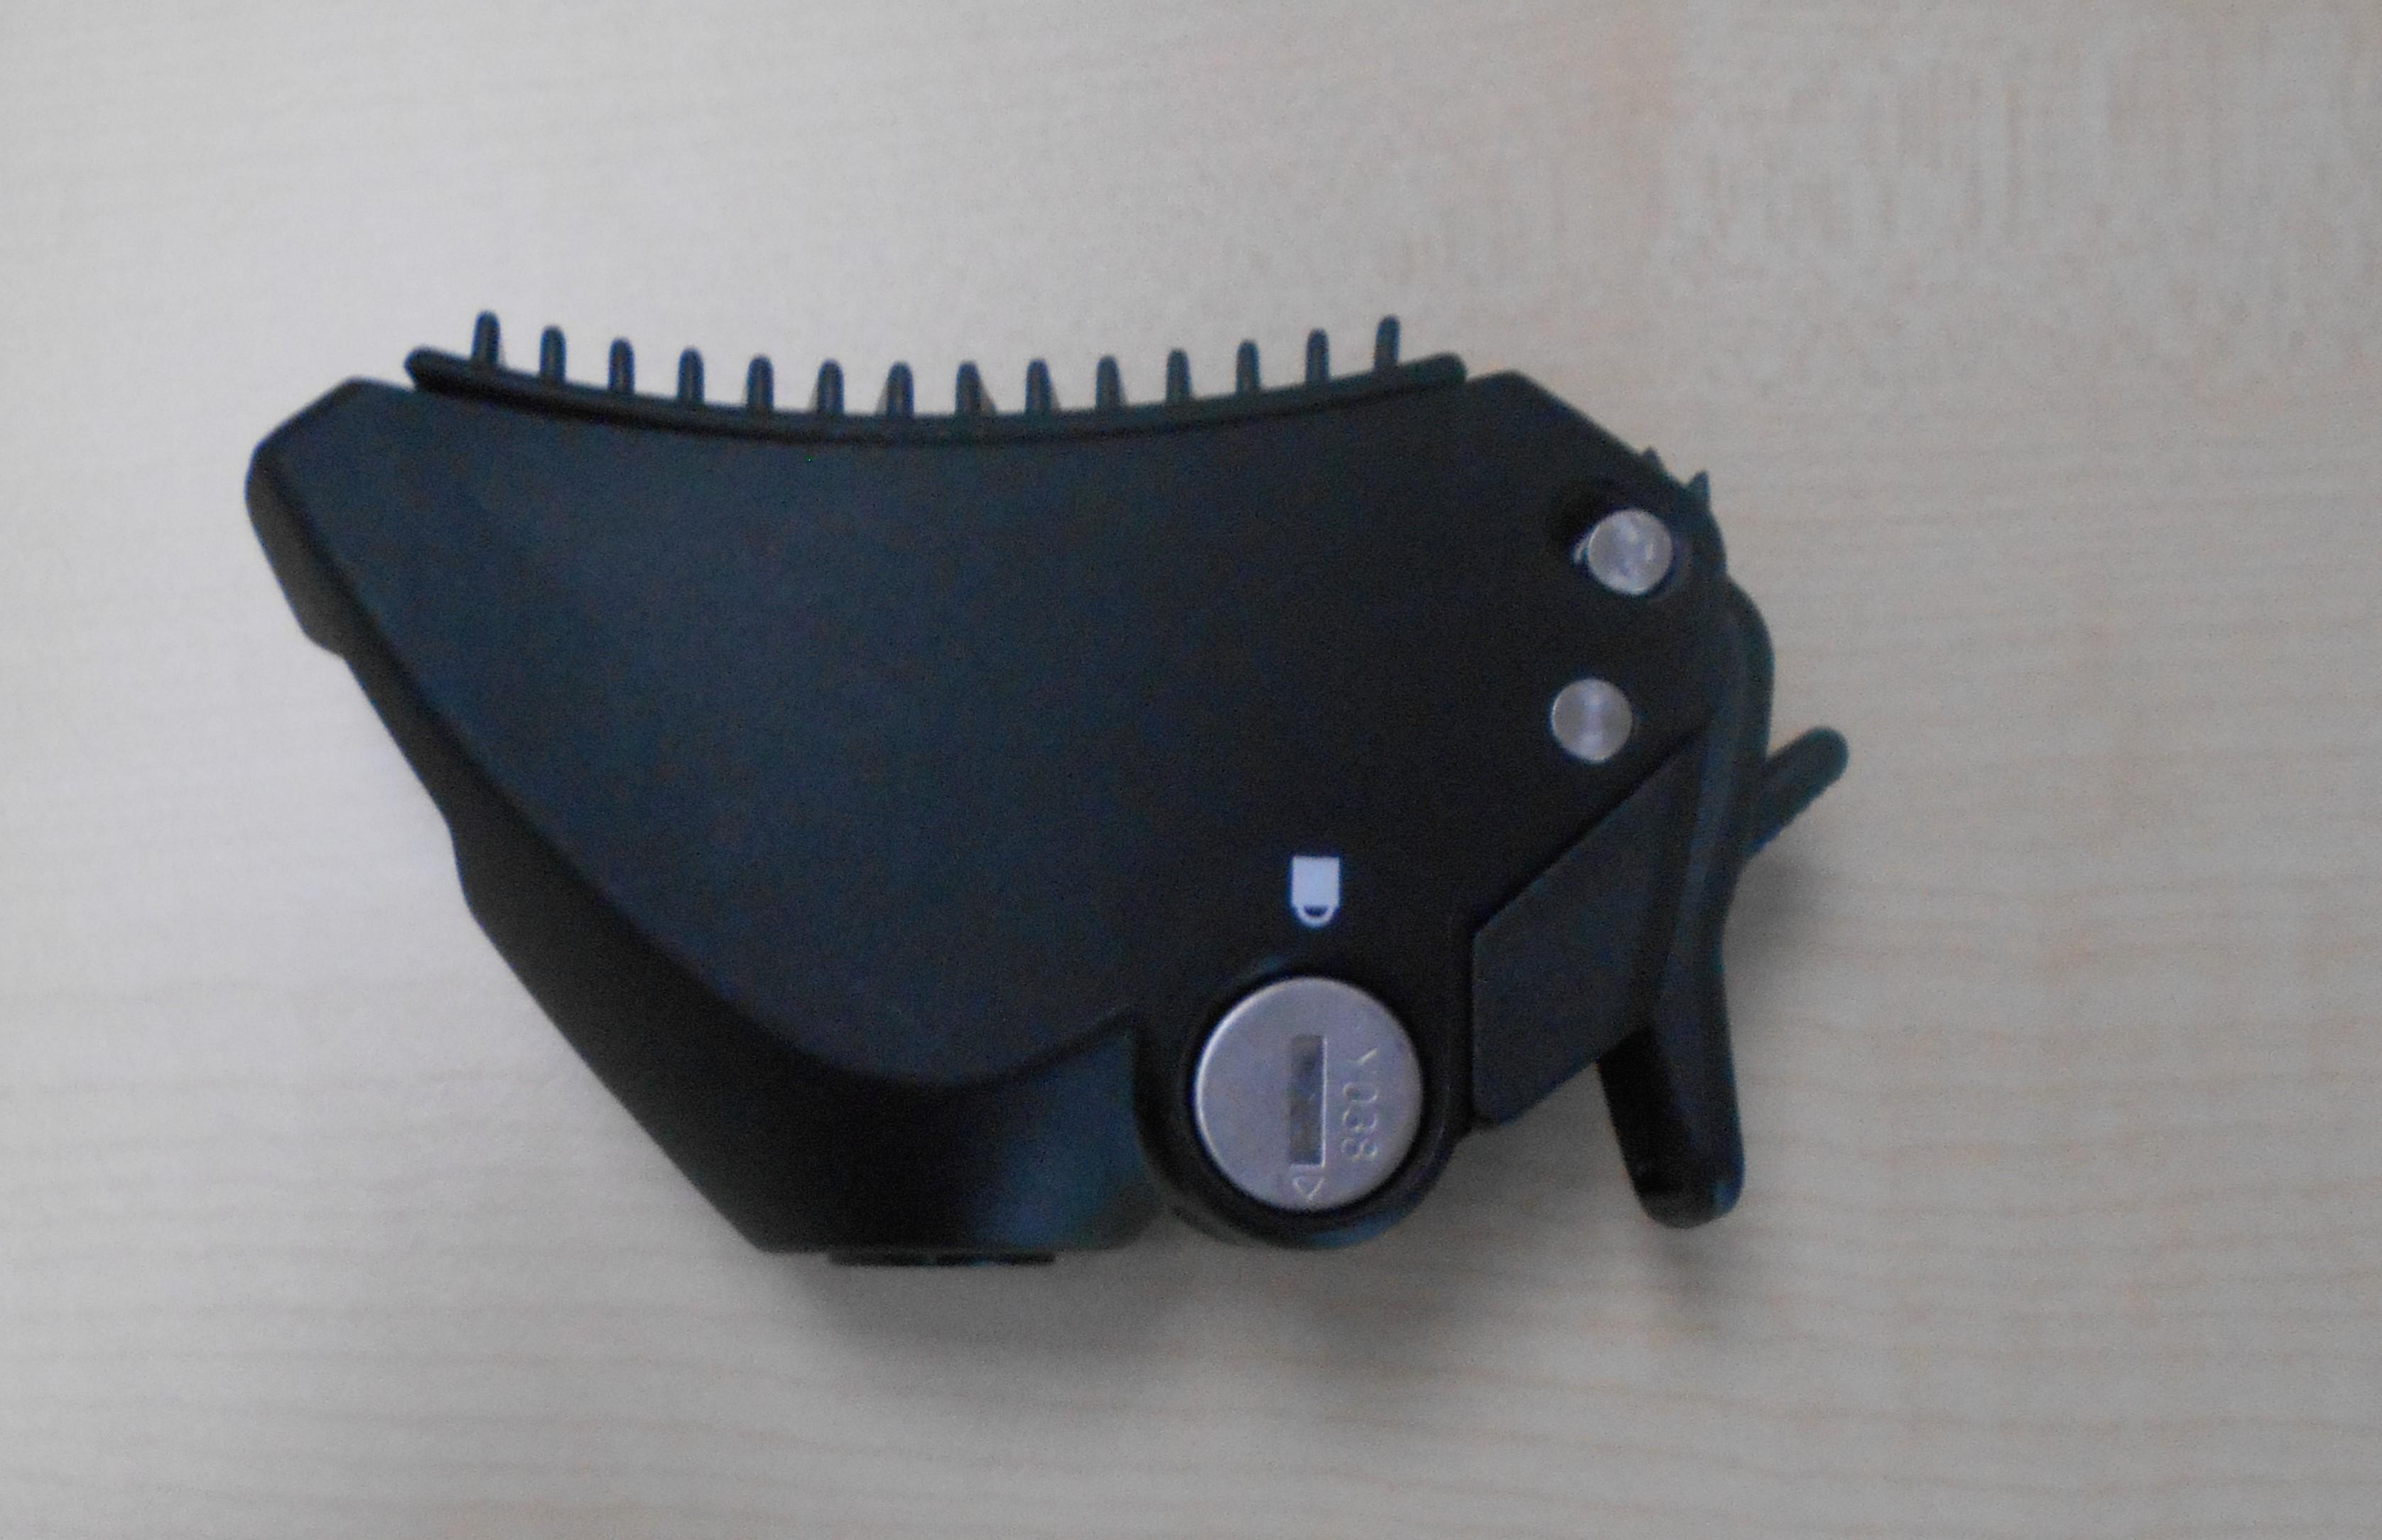 Kopf E-Bike Rahmenhalter mit Schlosscode Y038